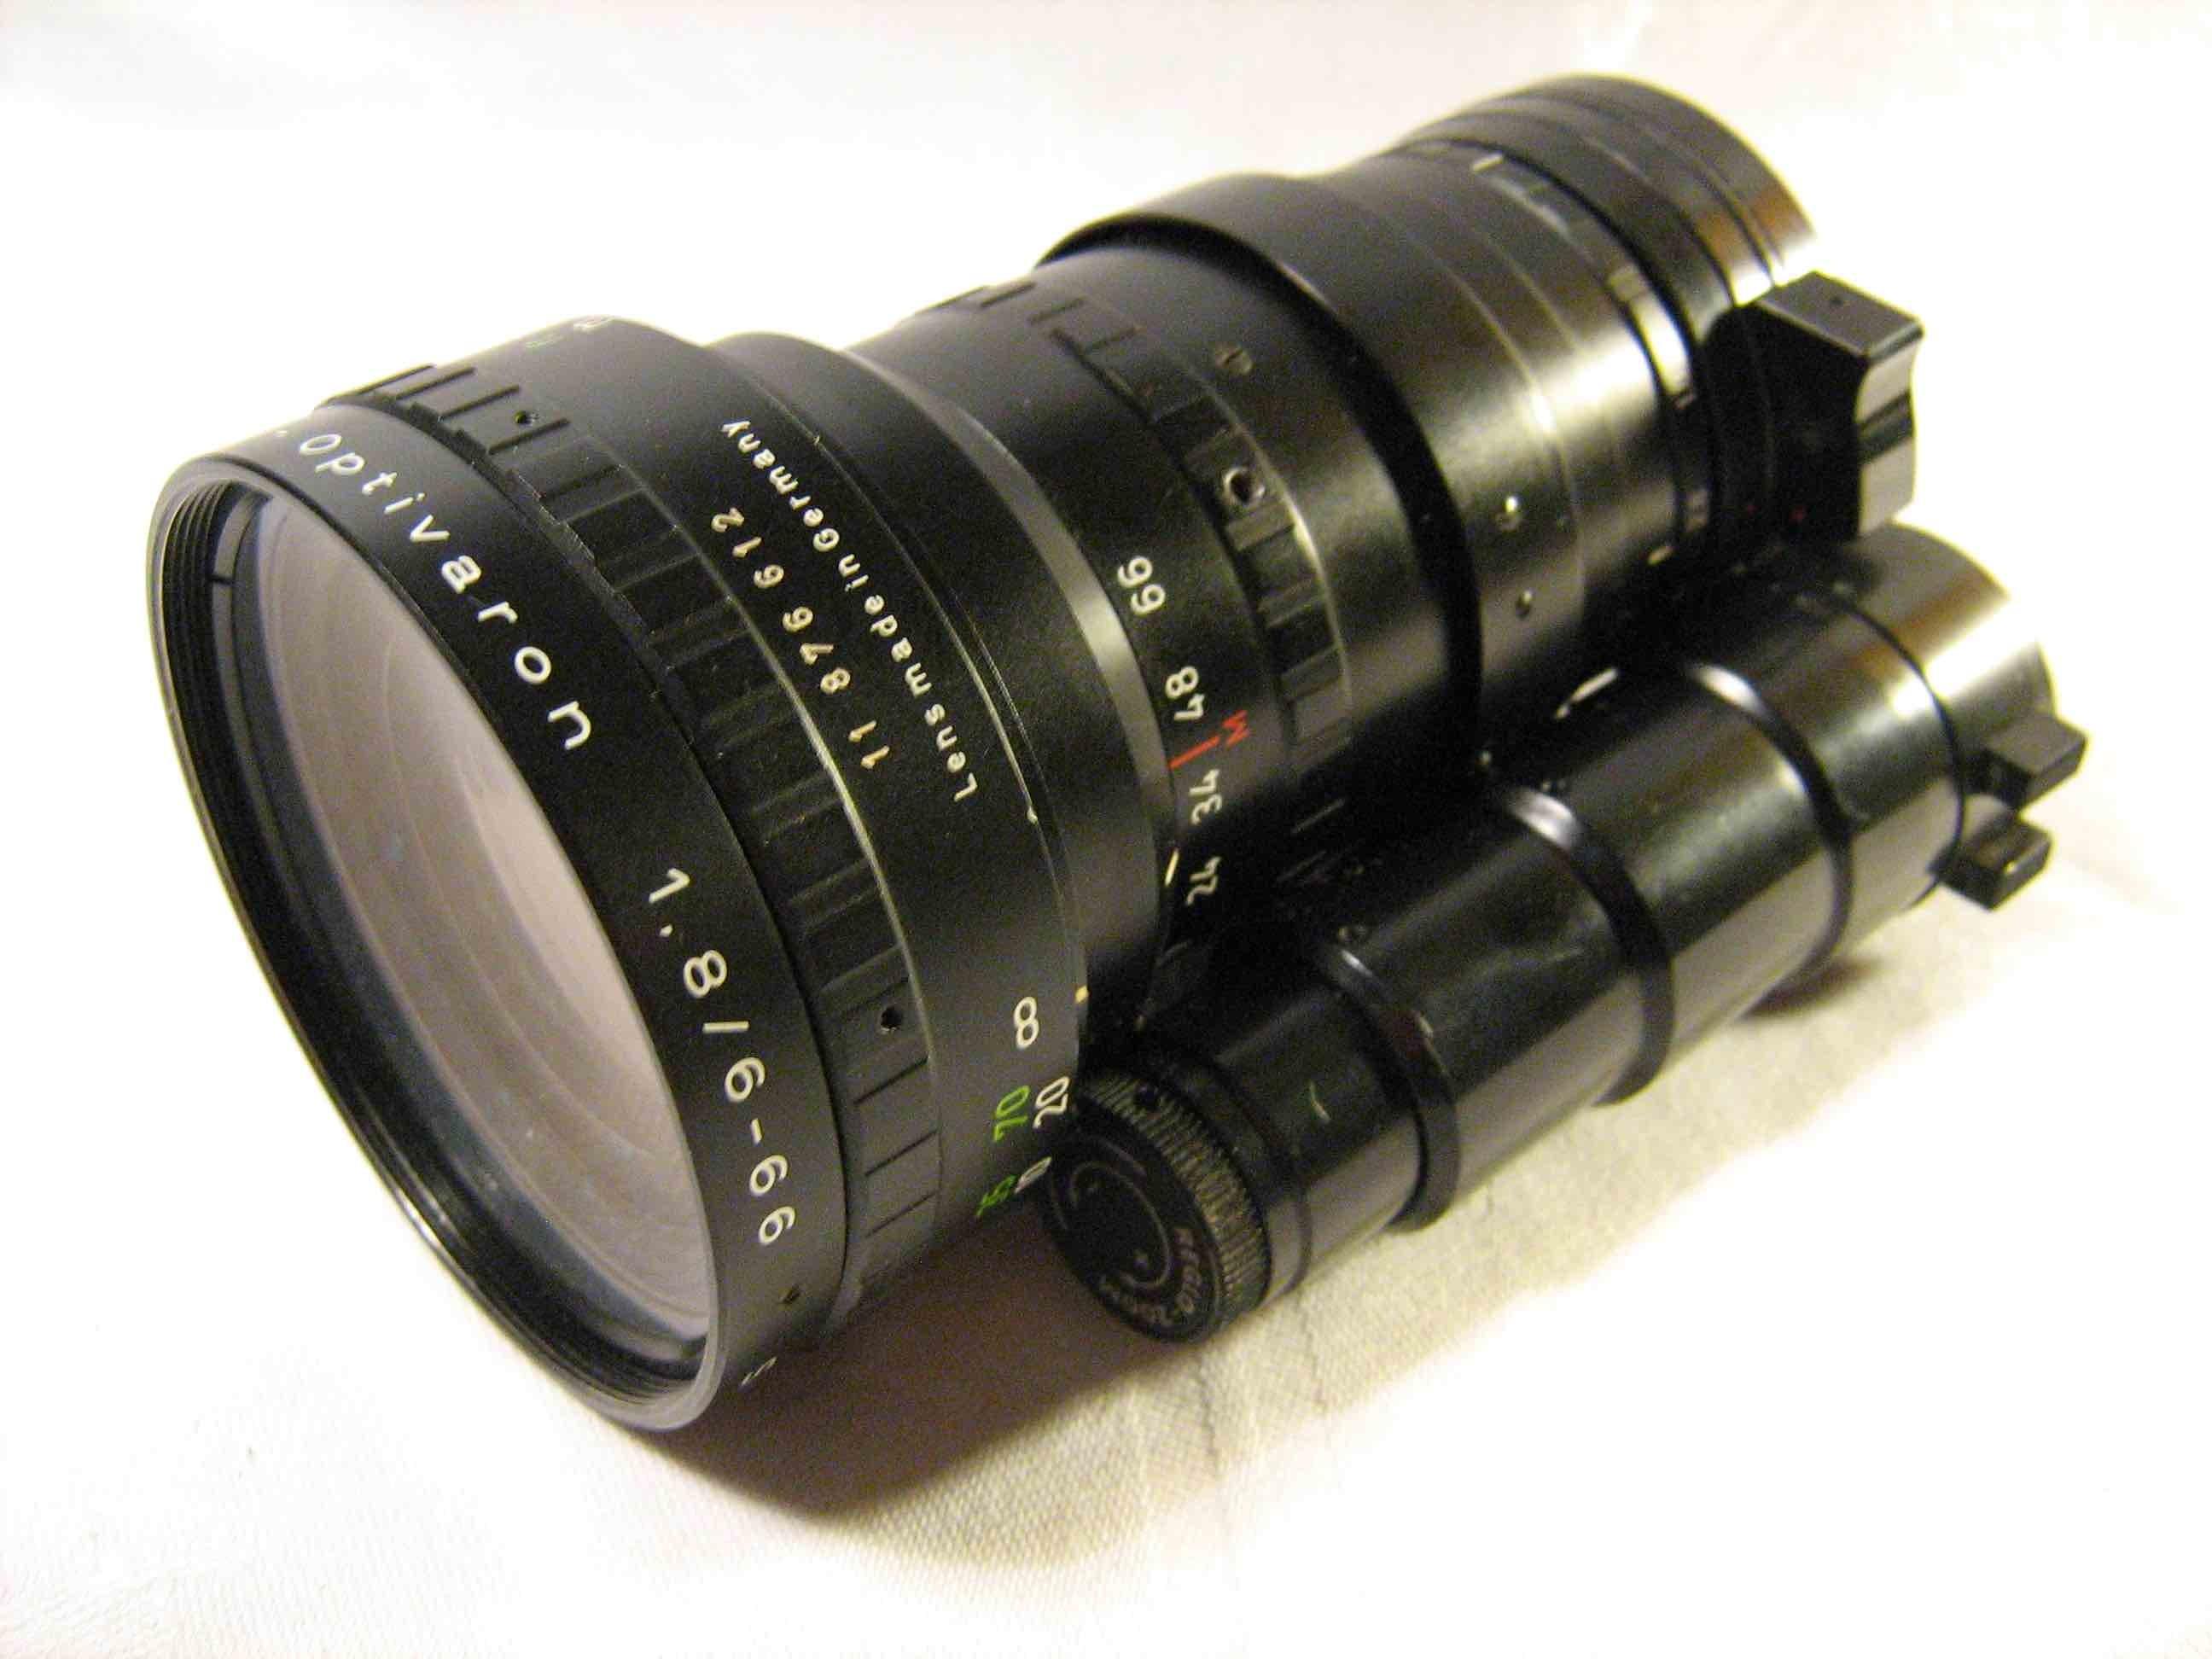 Schneider f1.8, 6-66 mm lens